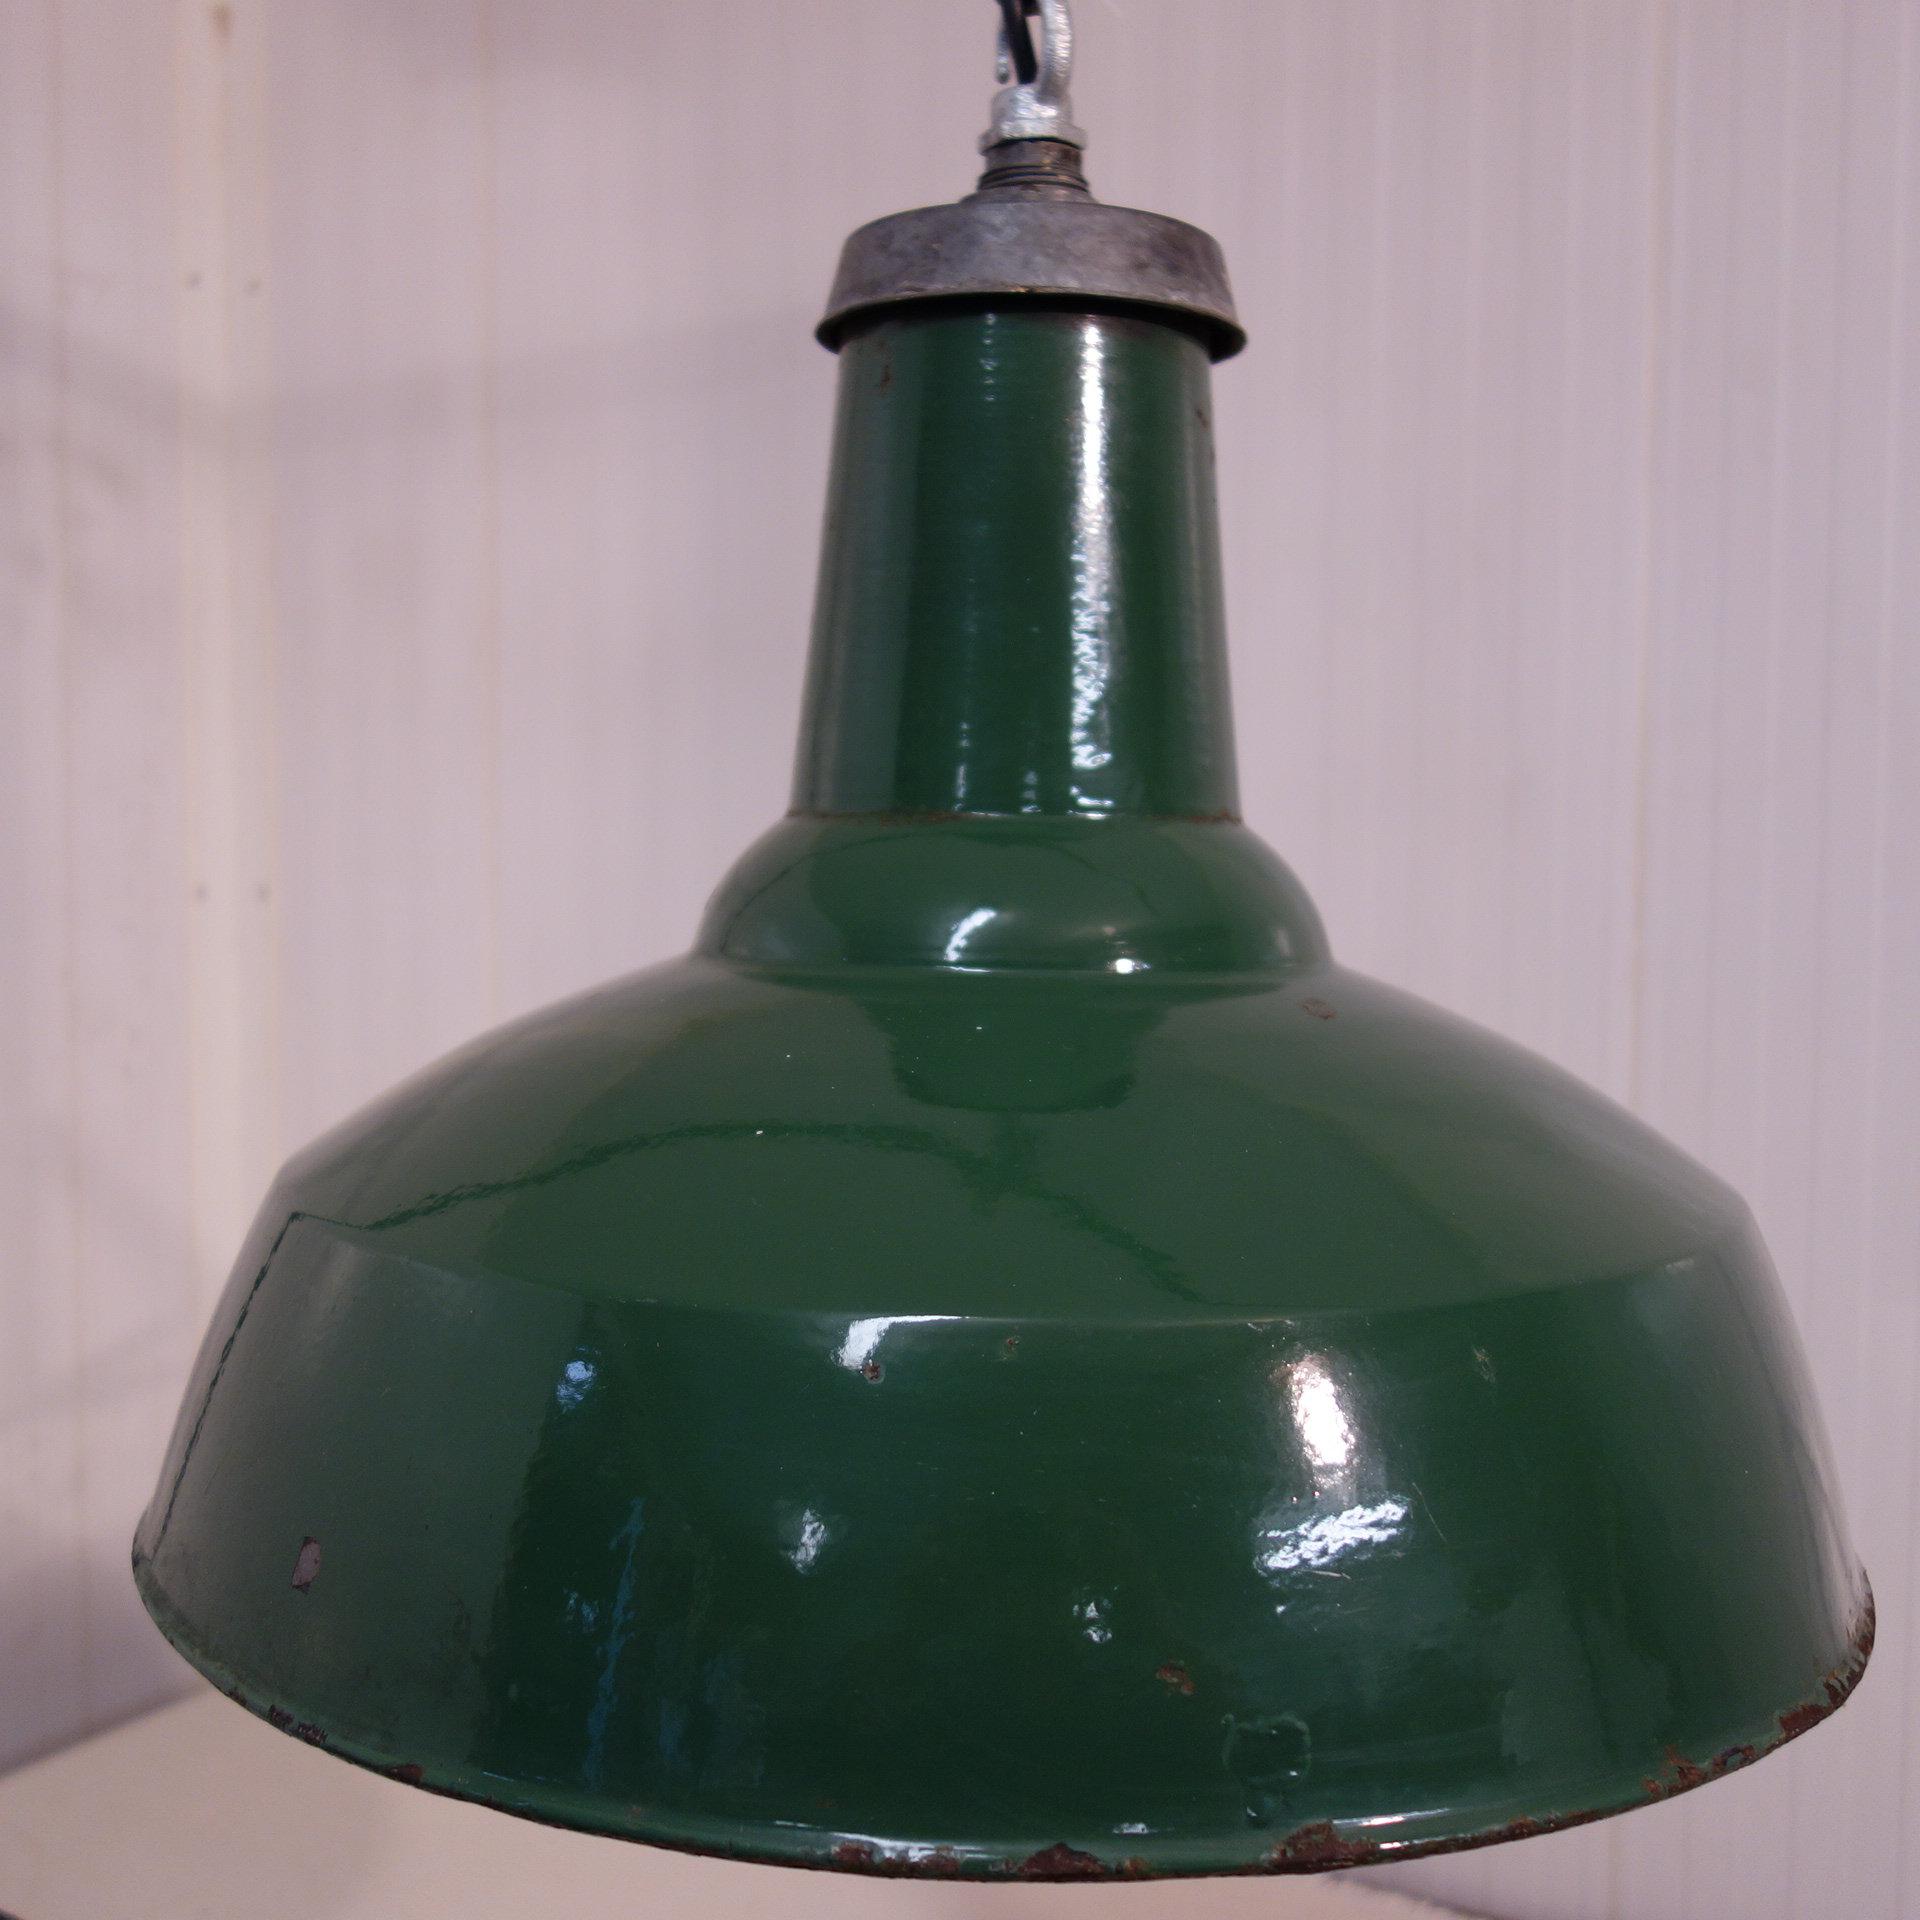 59dd4f7d69f2 1940's Green enamel factory lamp shade